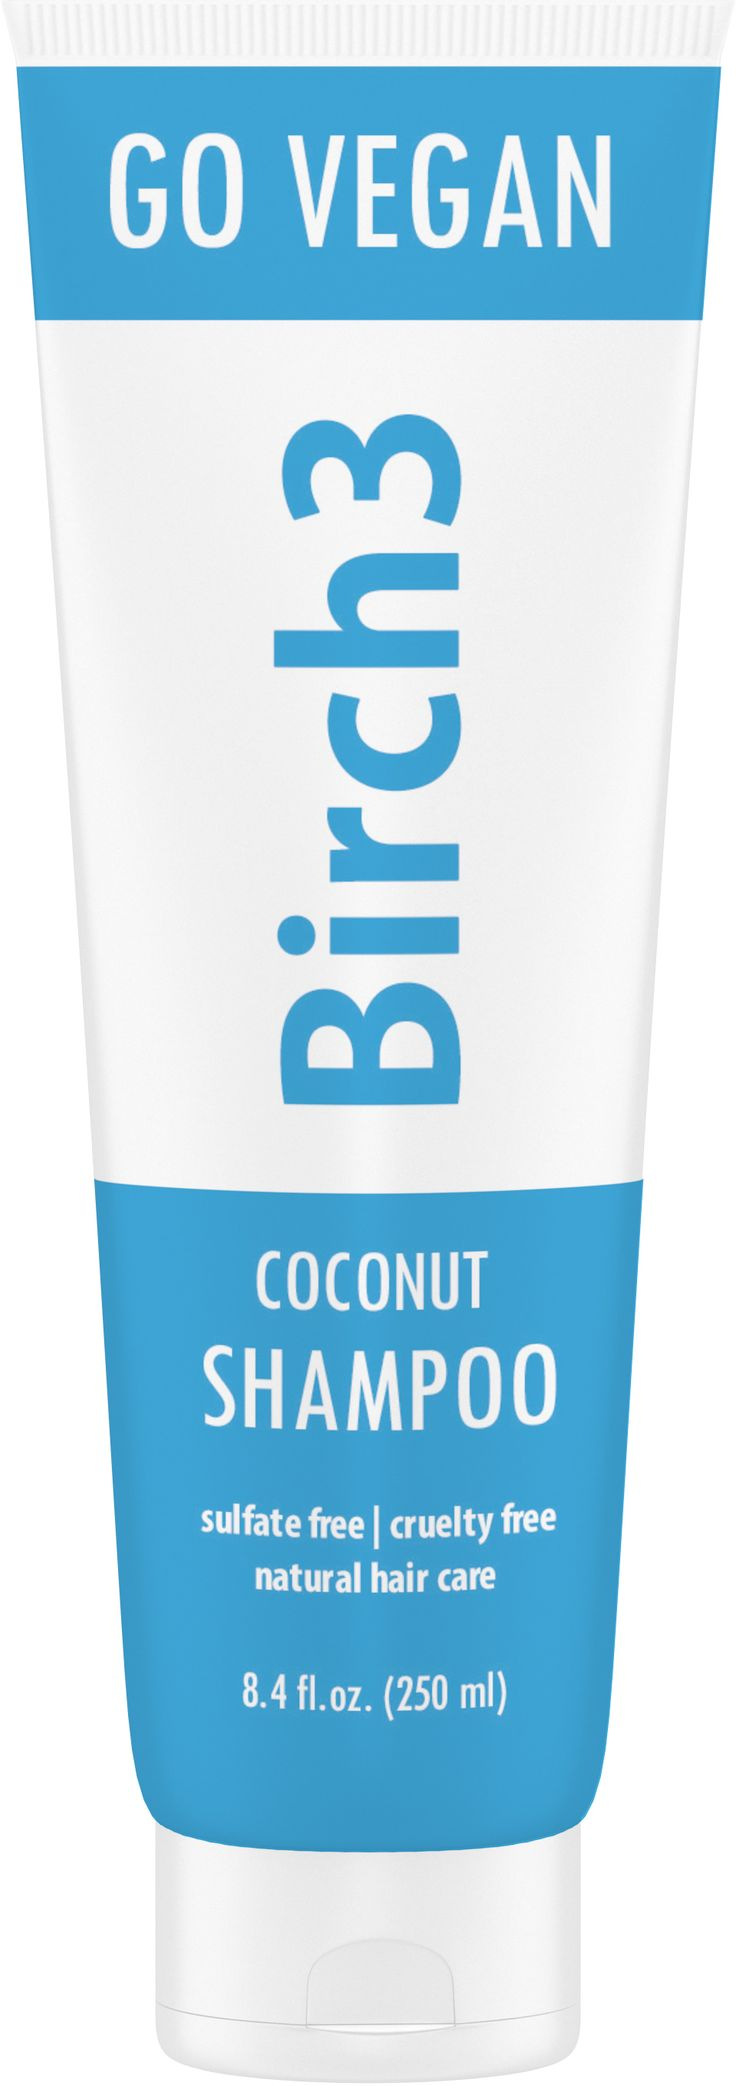 Coconut Vegan Shampoo